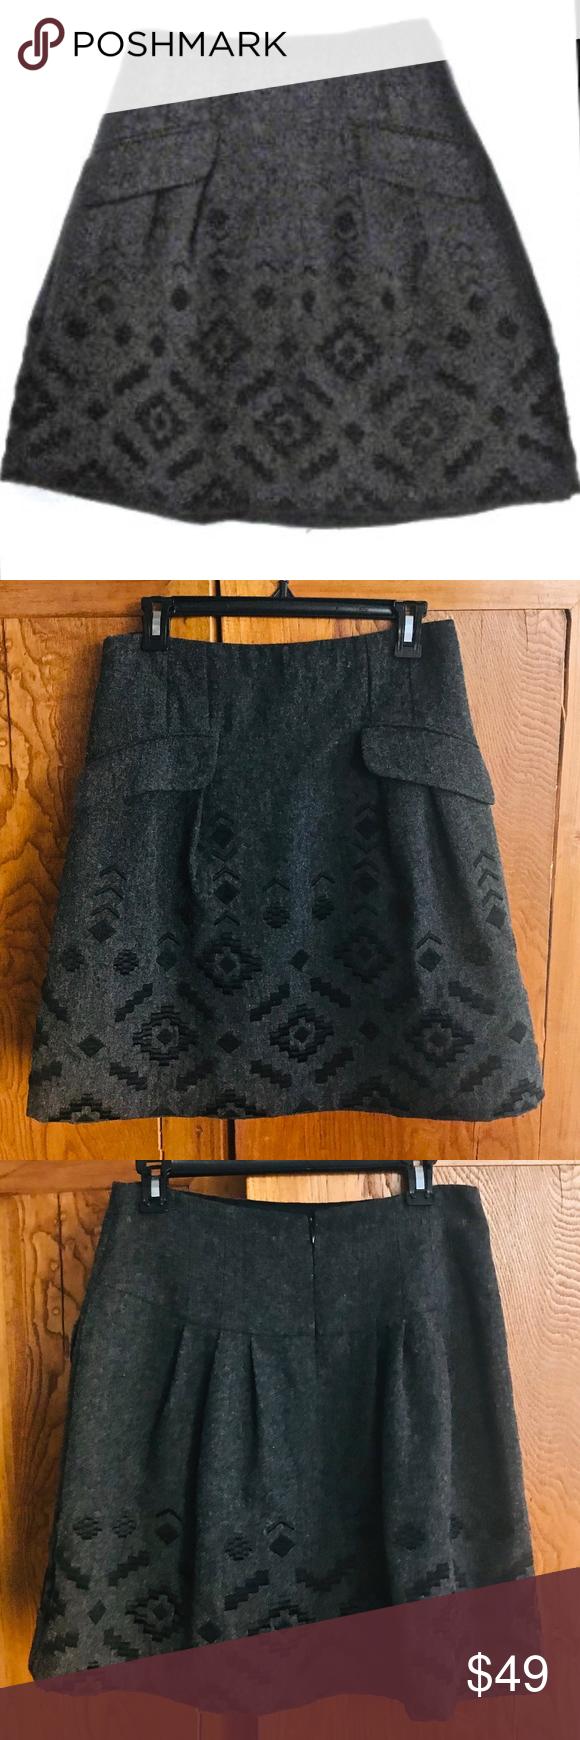 8a94430d6 Nanette Lepore Wool Mini Skirt - Size 8 Adorable Nanette Lepore skirt grey  wool with black